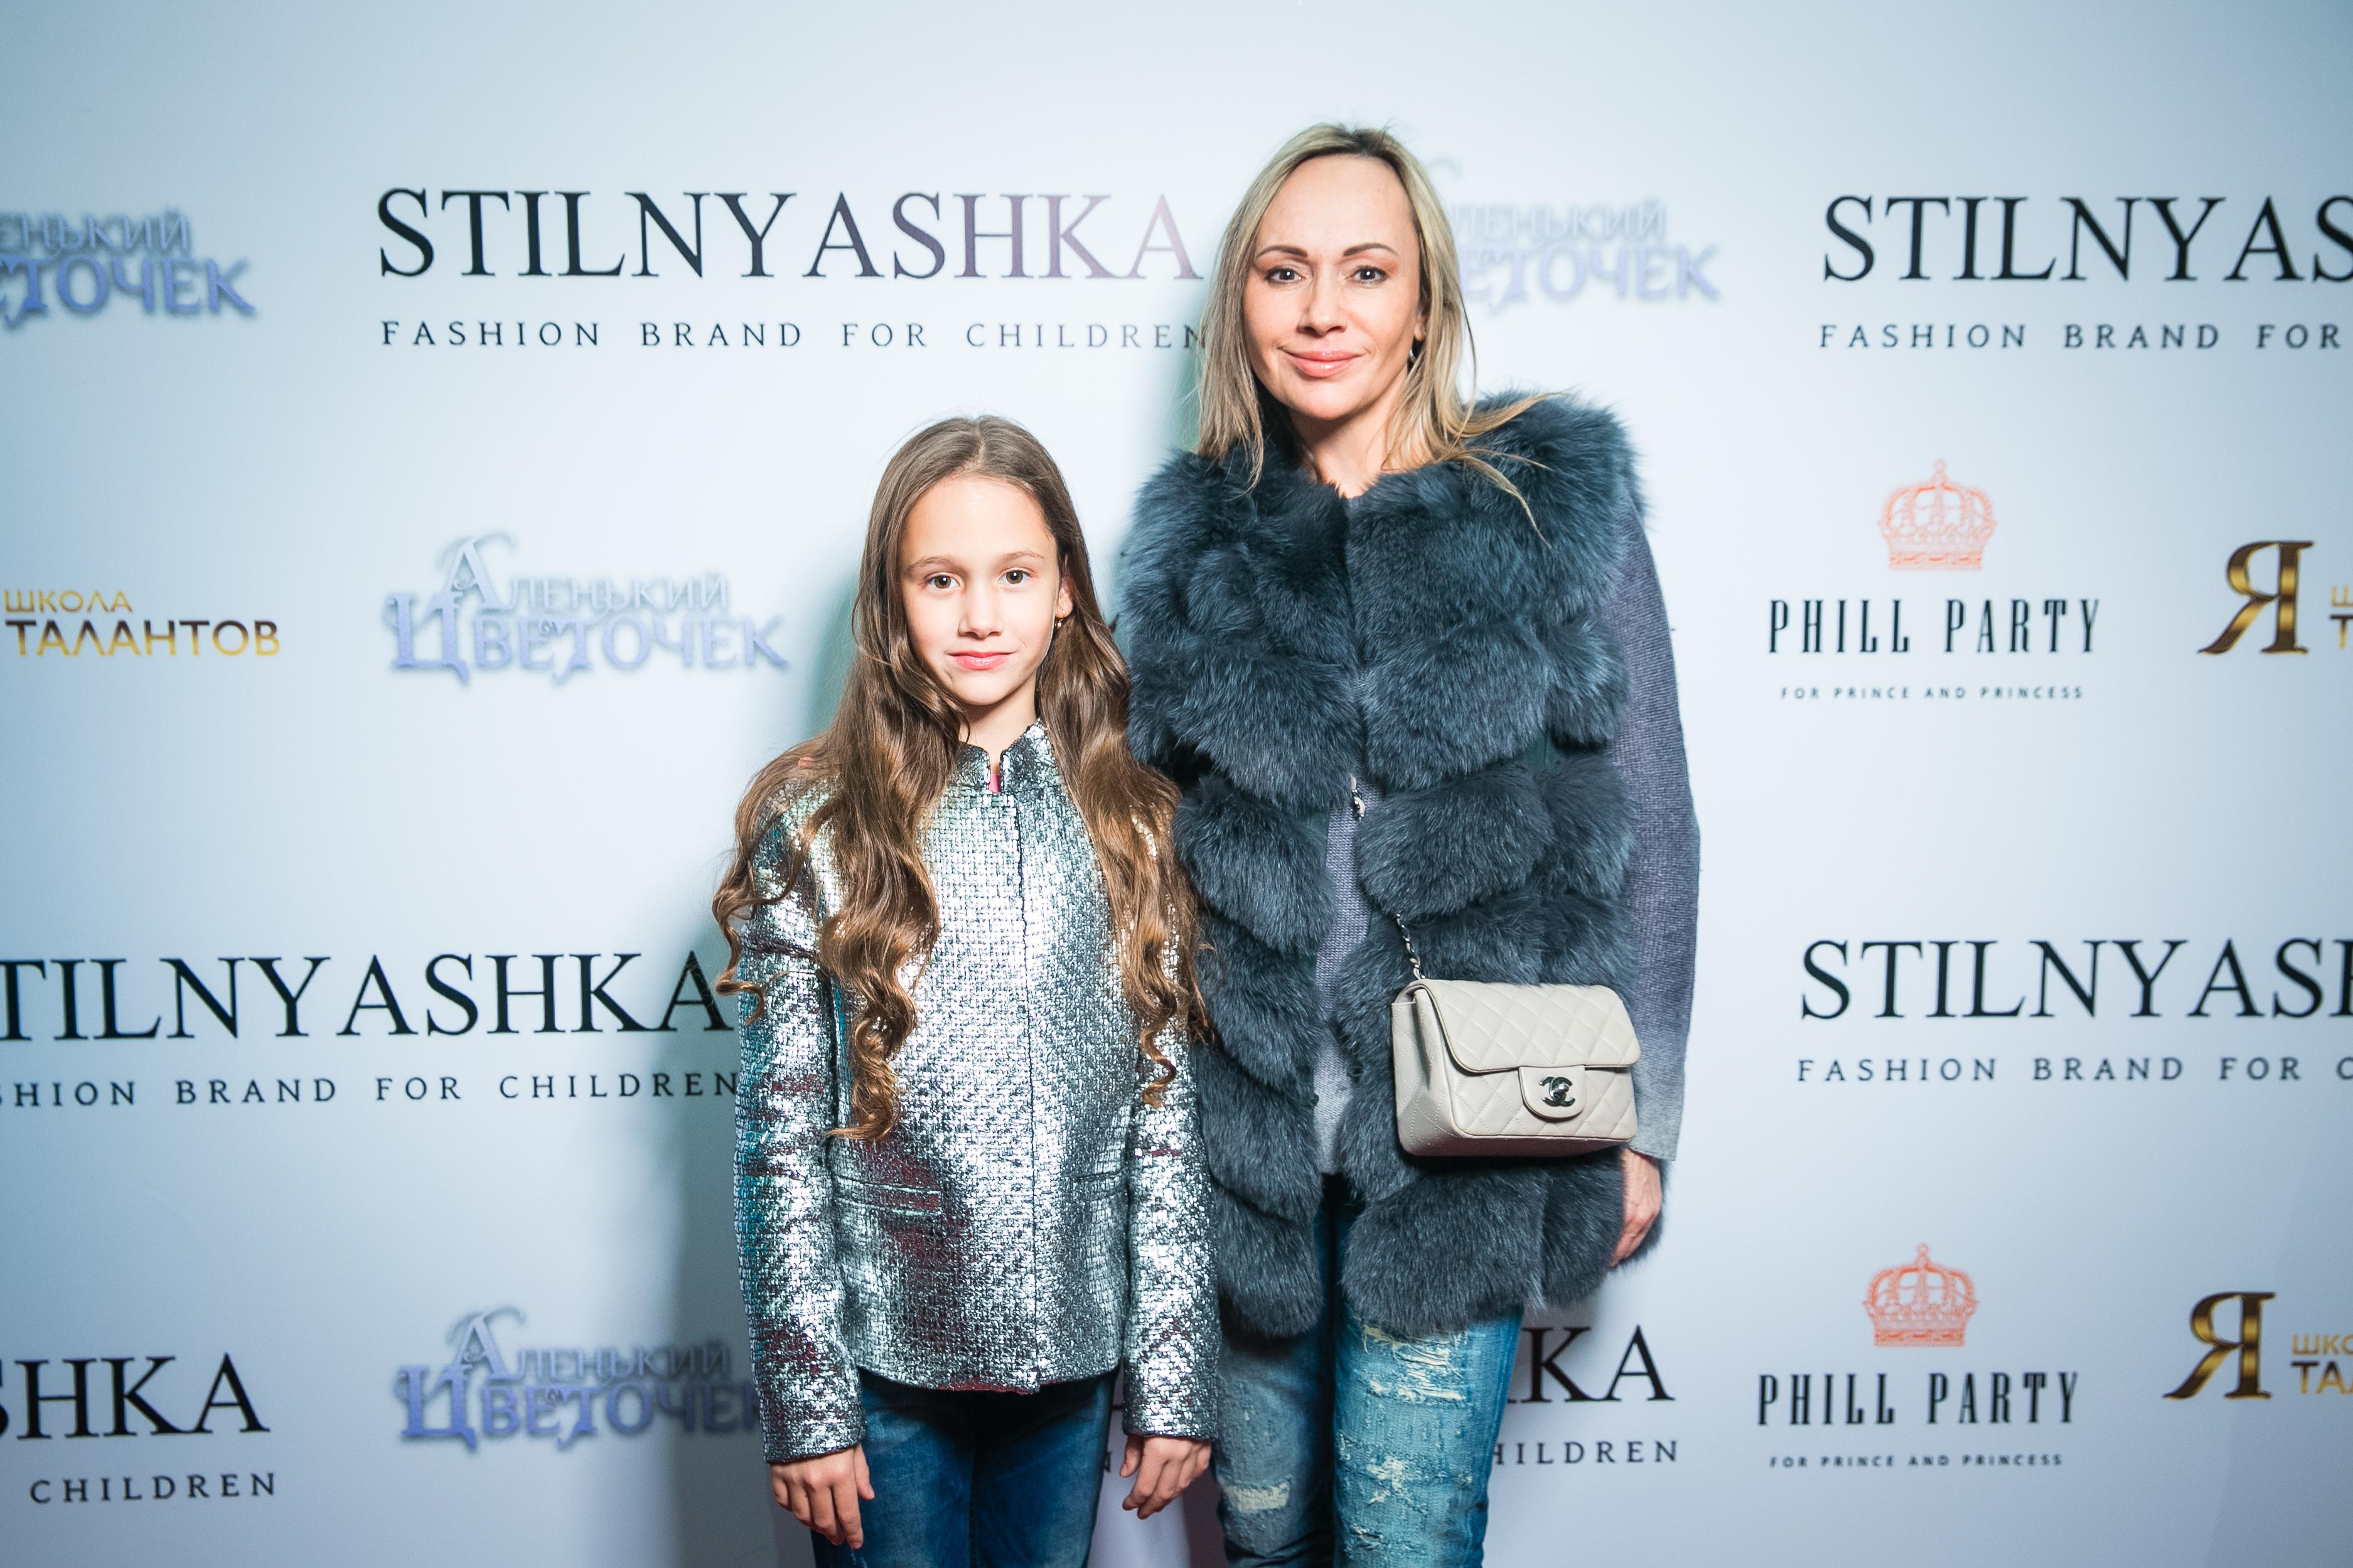 Показ модного дома Stilnyashka